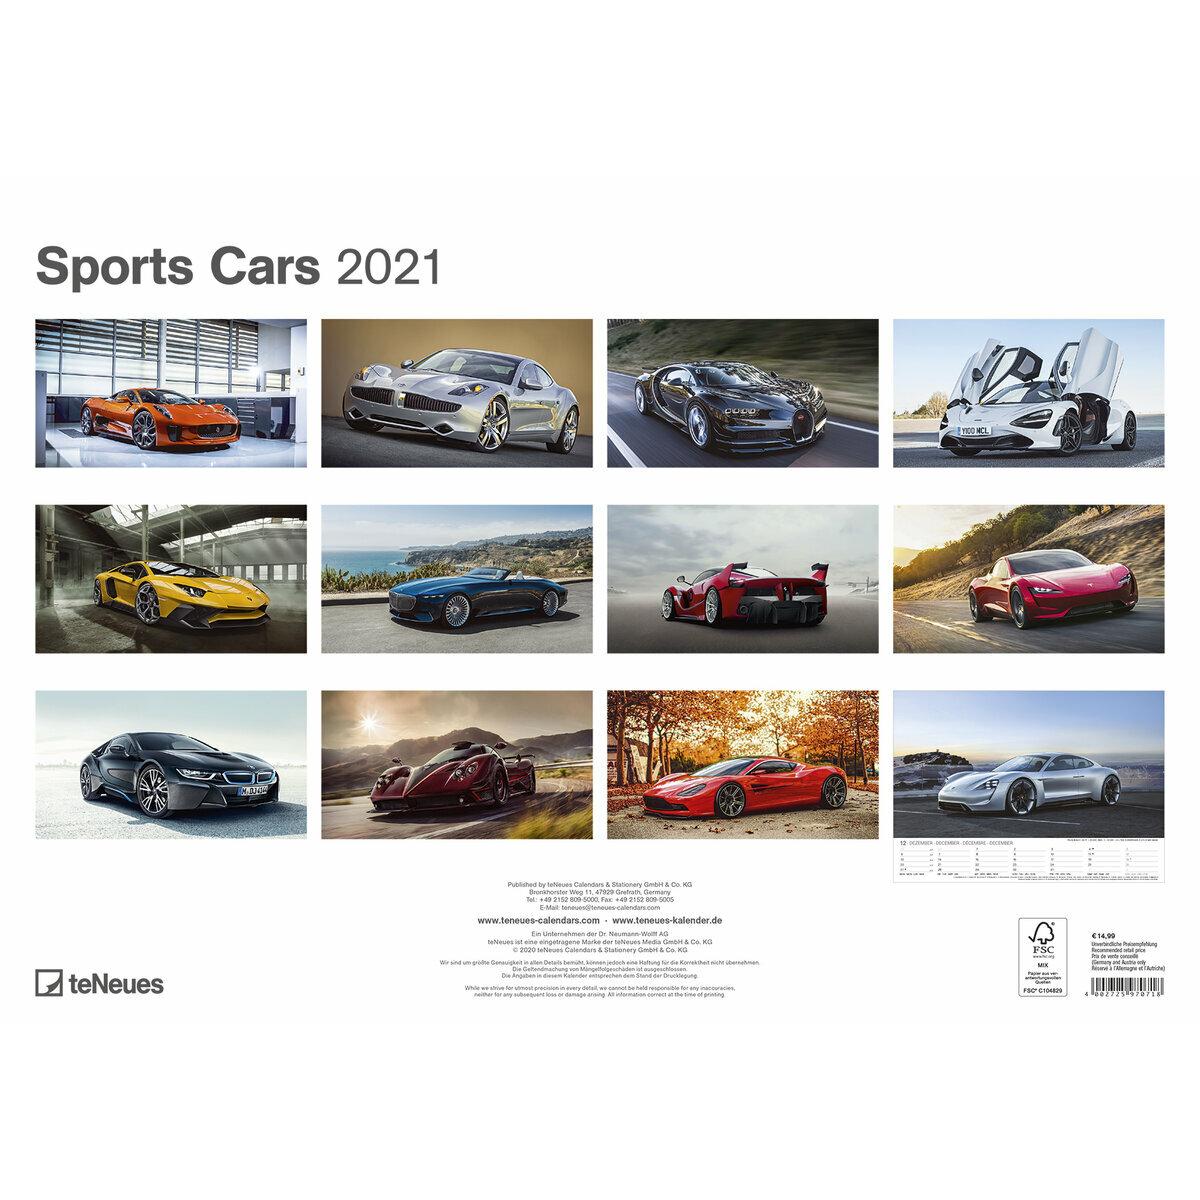 Calendrier Des Sportifs 2021 Maxi Calendrier 2021 Voiture sportive